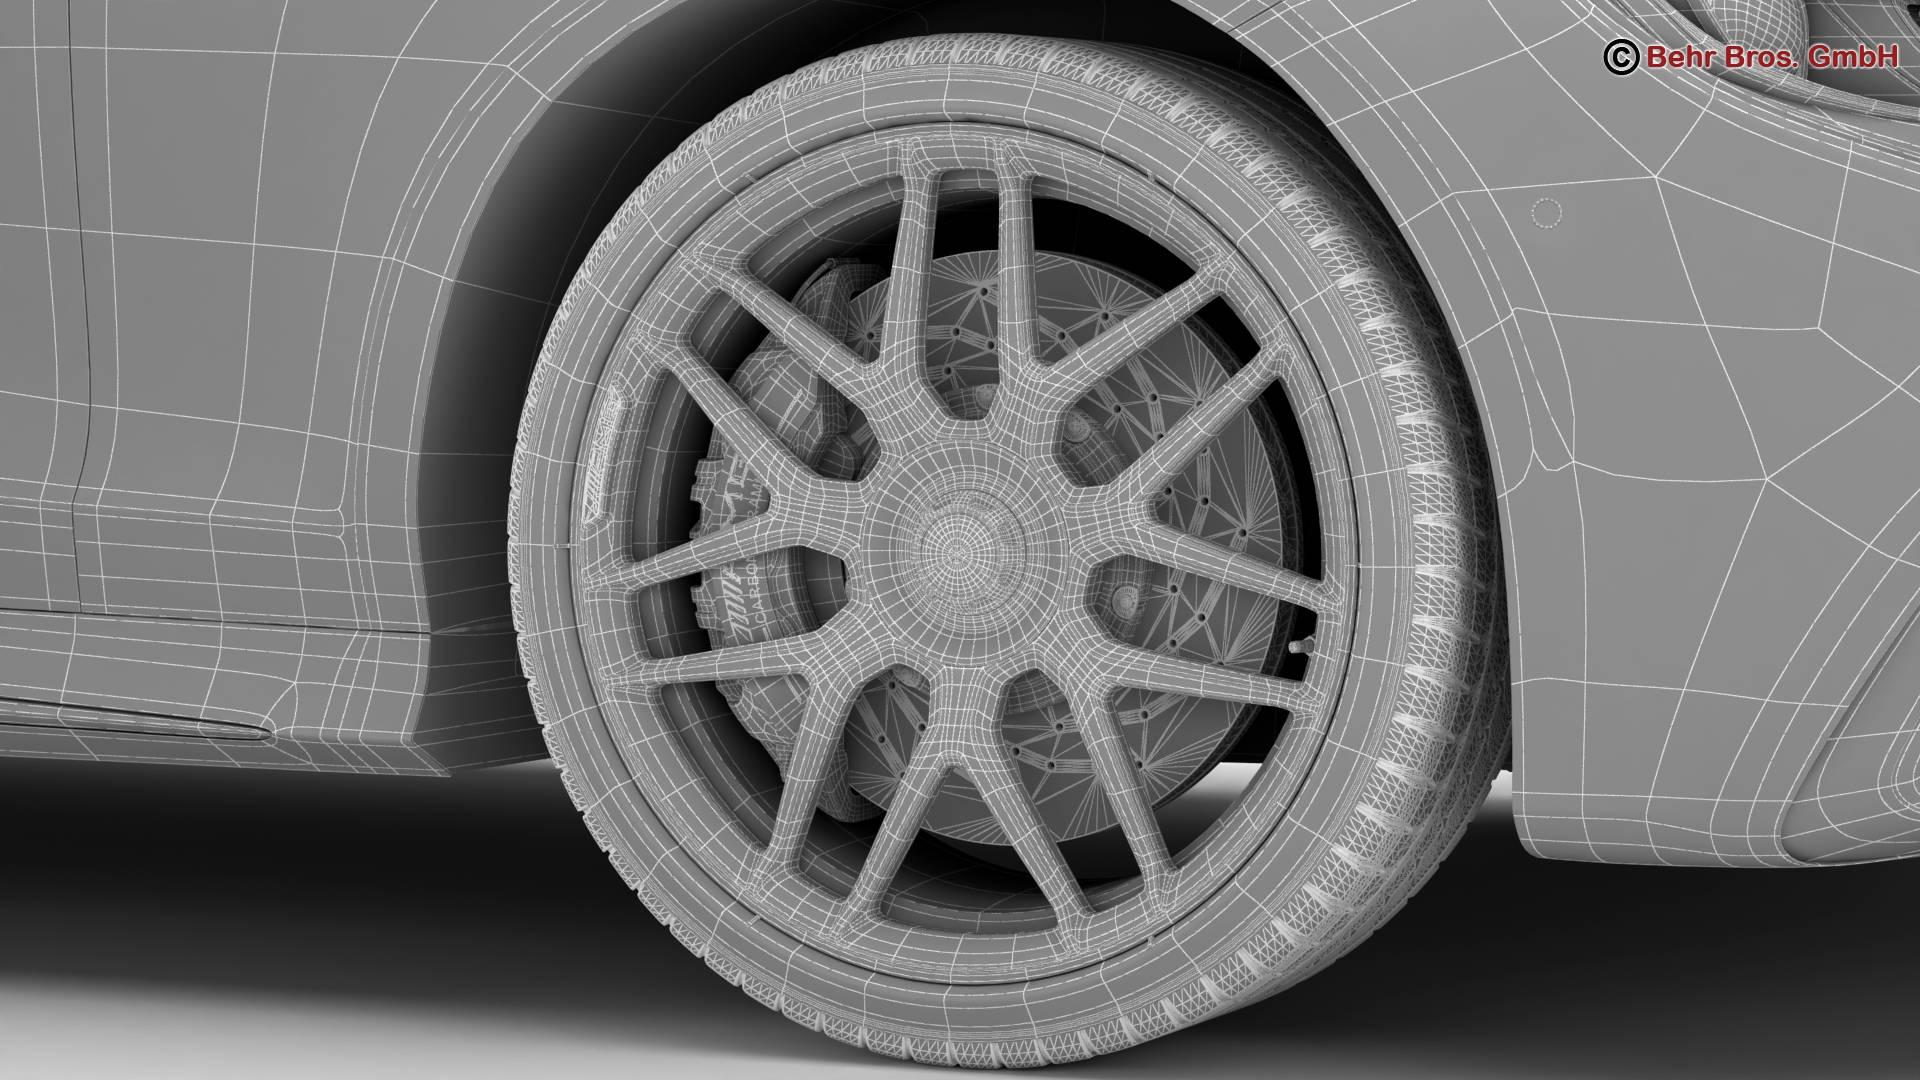 mercedes s class coupe amg s63 2018 3d model 3ds max fbx c4d lwo ma mb obj 274112